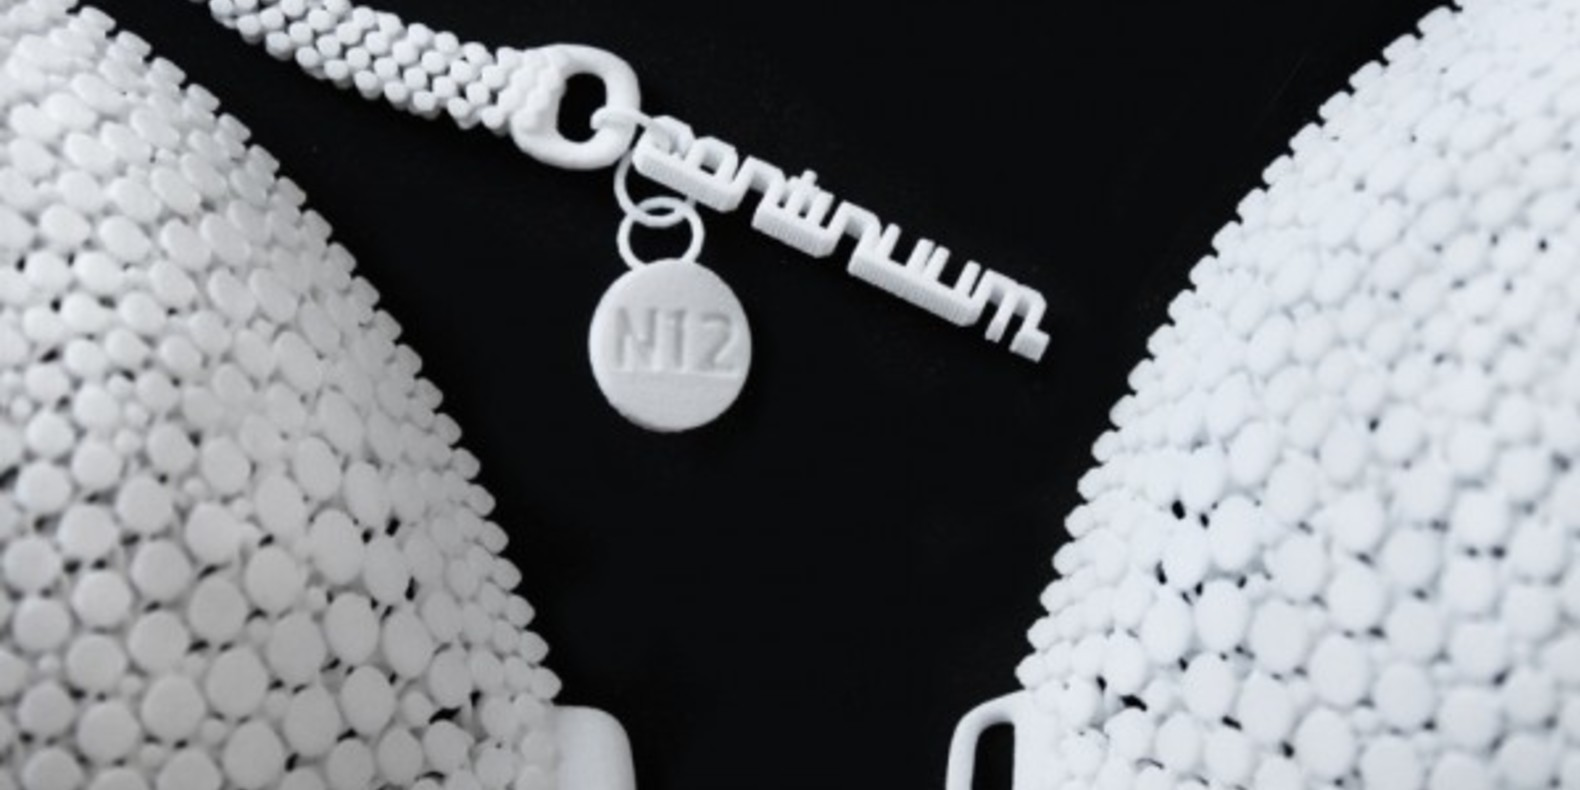 N12 bikini 3D printed printing cults shapeways fichier 3D 4